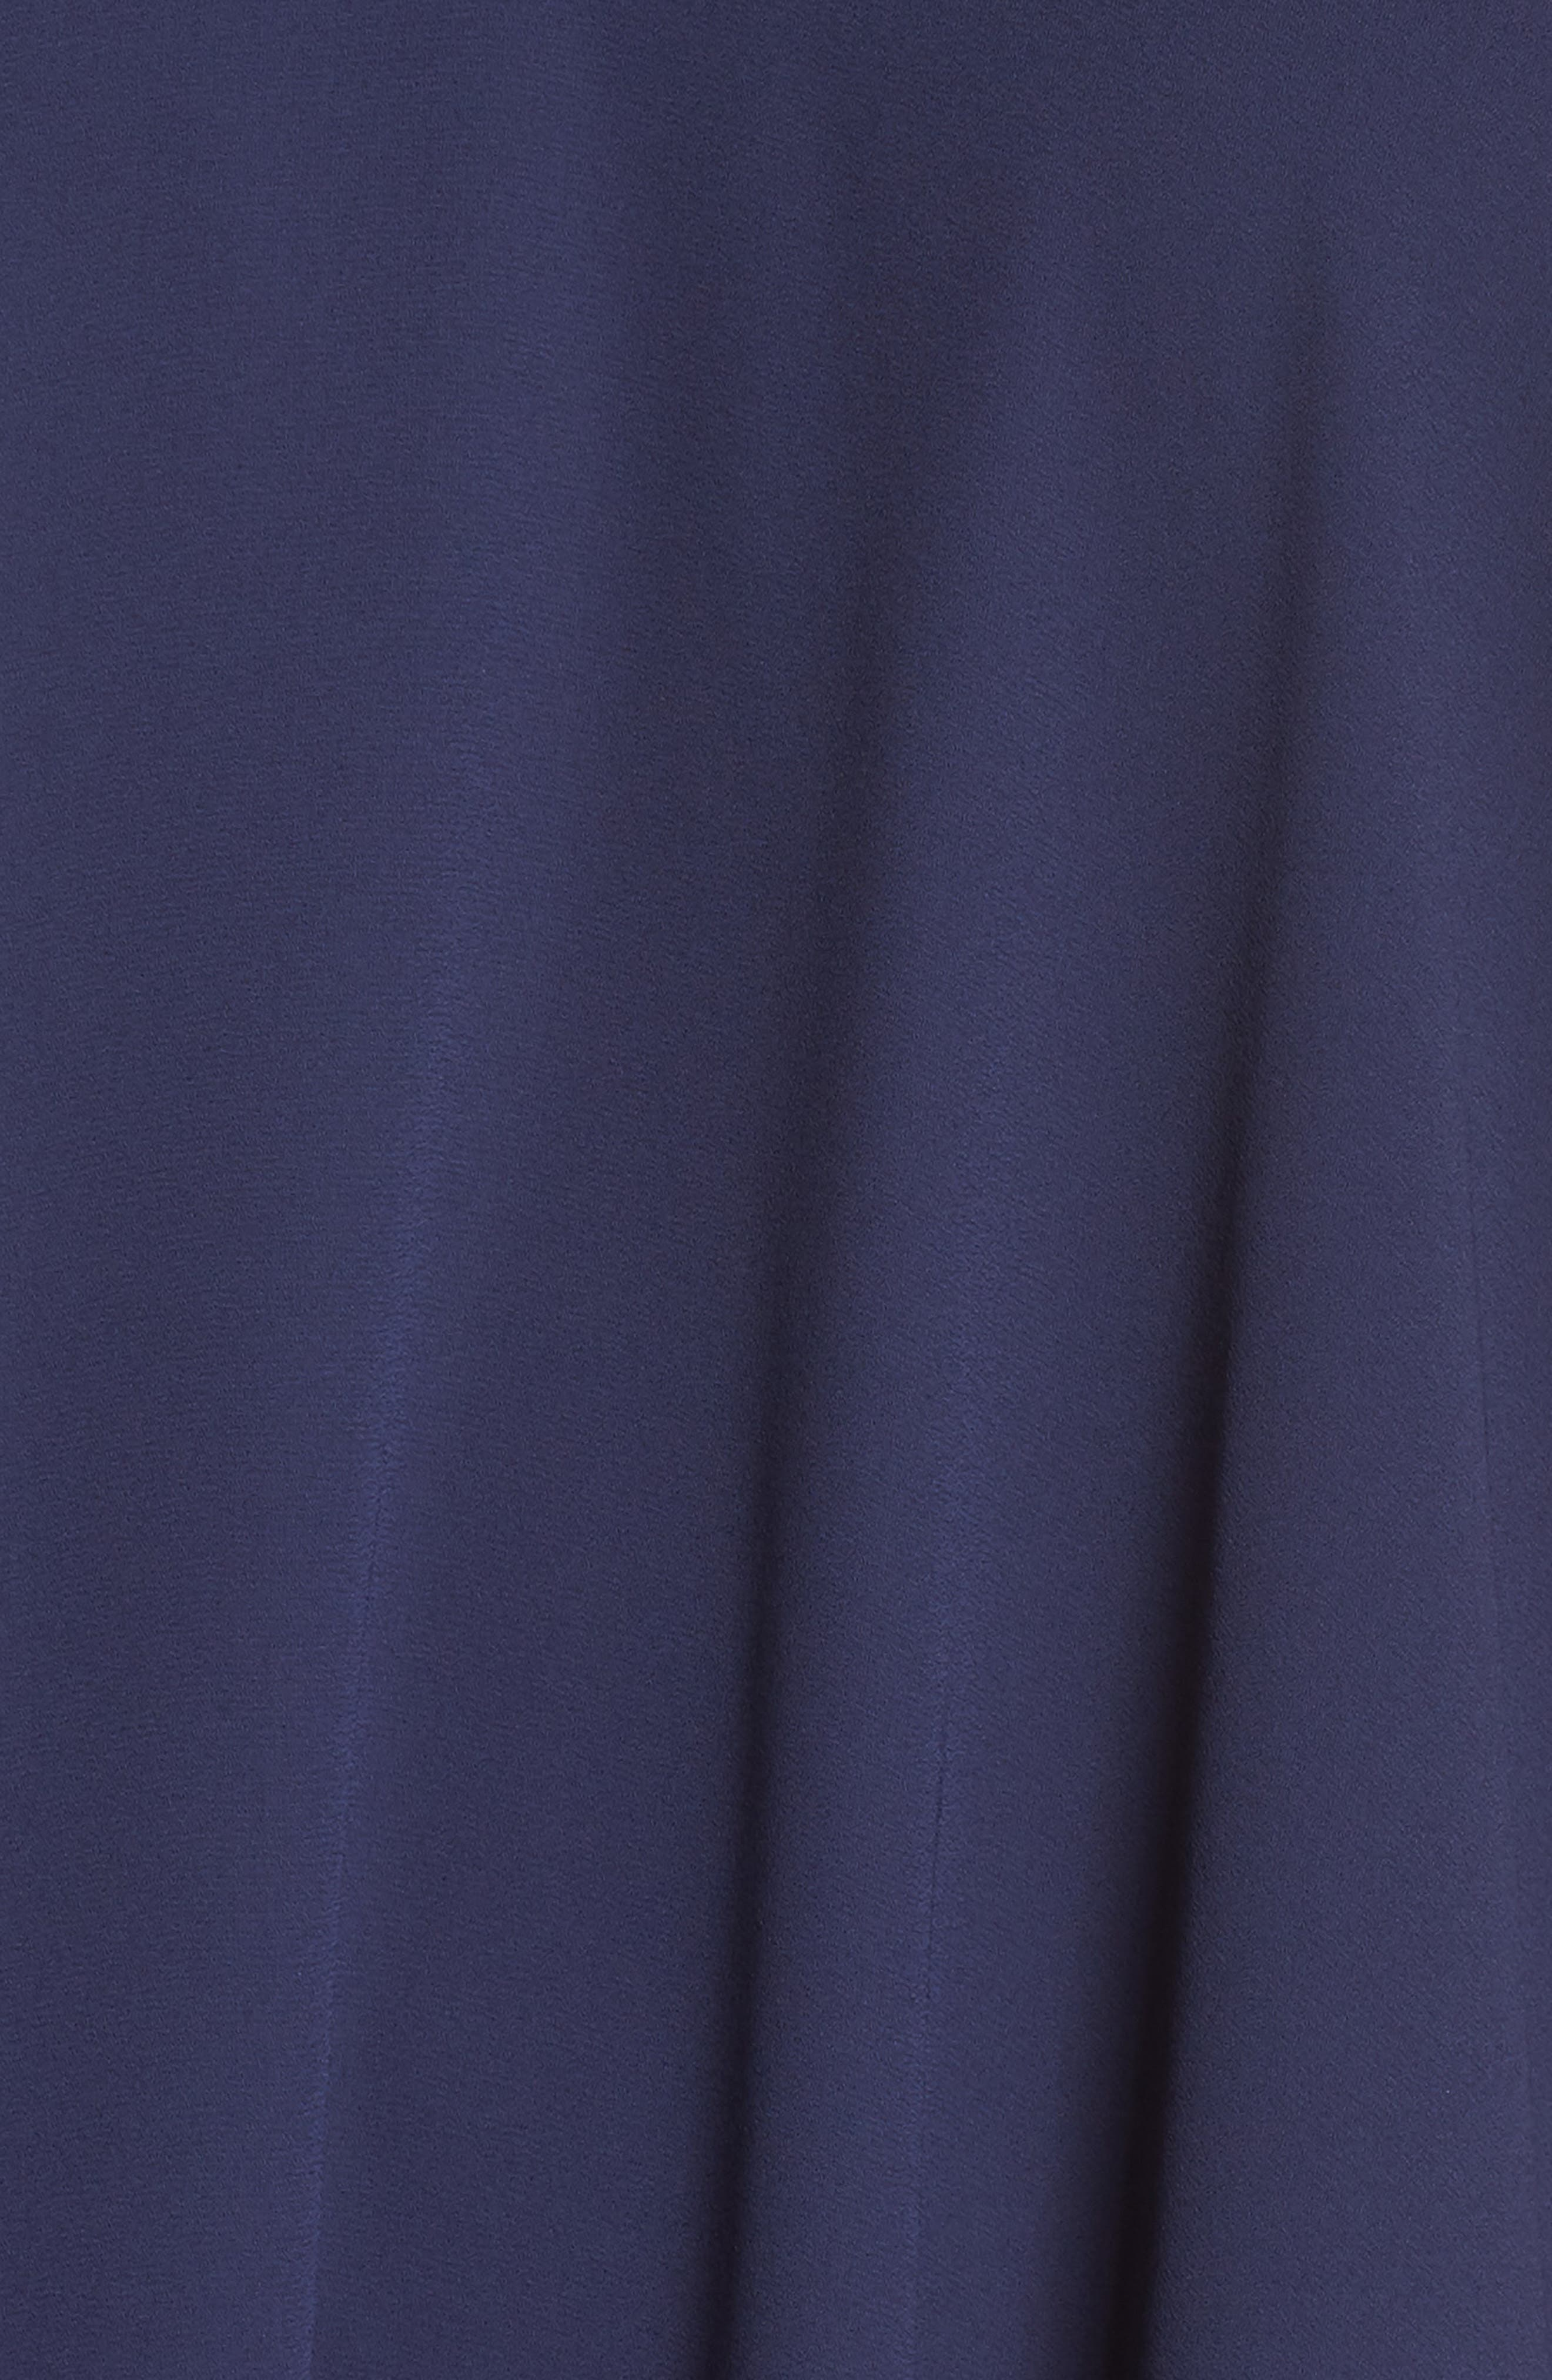 Draped Racerback Georgette Trapeze Dress,                             Alternate thumbnail 6, color,                             412